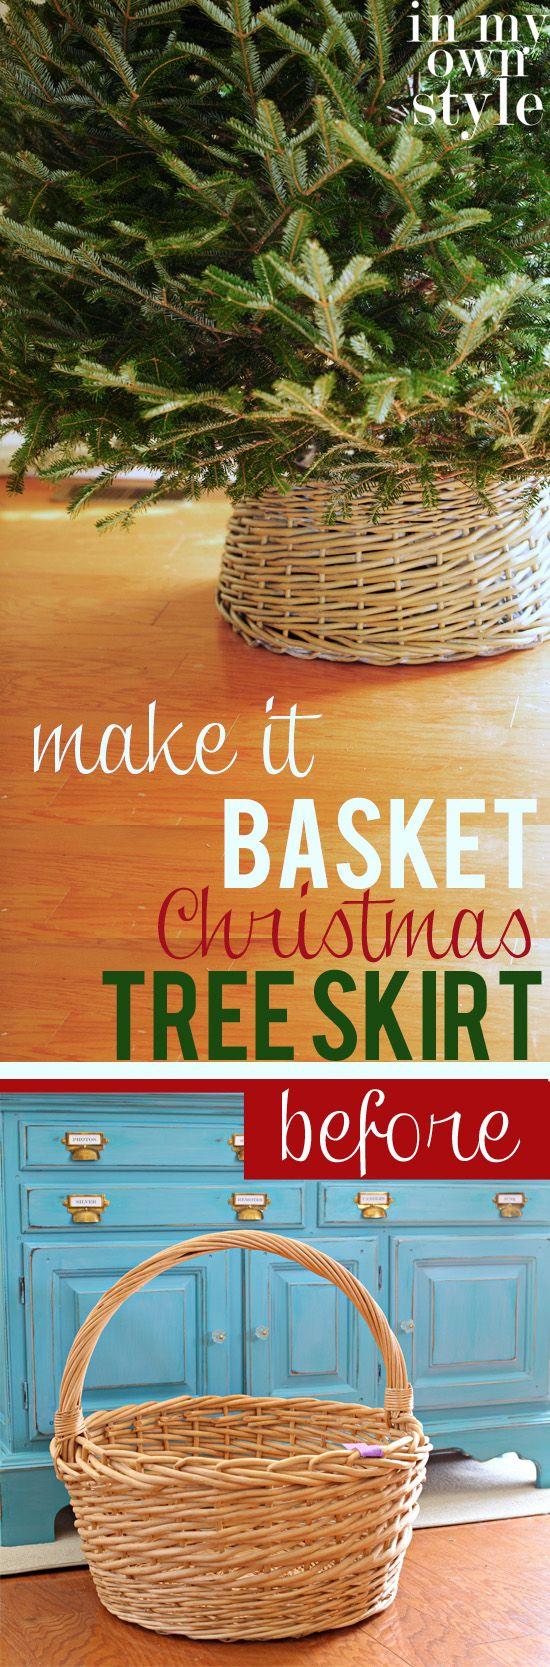 DIY: Basket Christmas Tree Skirt http://inmyownstyle.com/2013/12/diy-basket-christmas-tree-skirt.html?utm_campaign=coschedule&utm_source=pinterest&utm_medium=Diane%20Henkler%20%7BInMyOwnStyle.com%7D&utm_content=DIY%3A%20Basket%20Christmas%20Tree%20Skirt